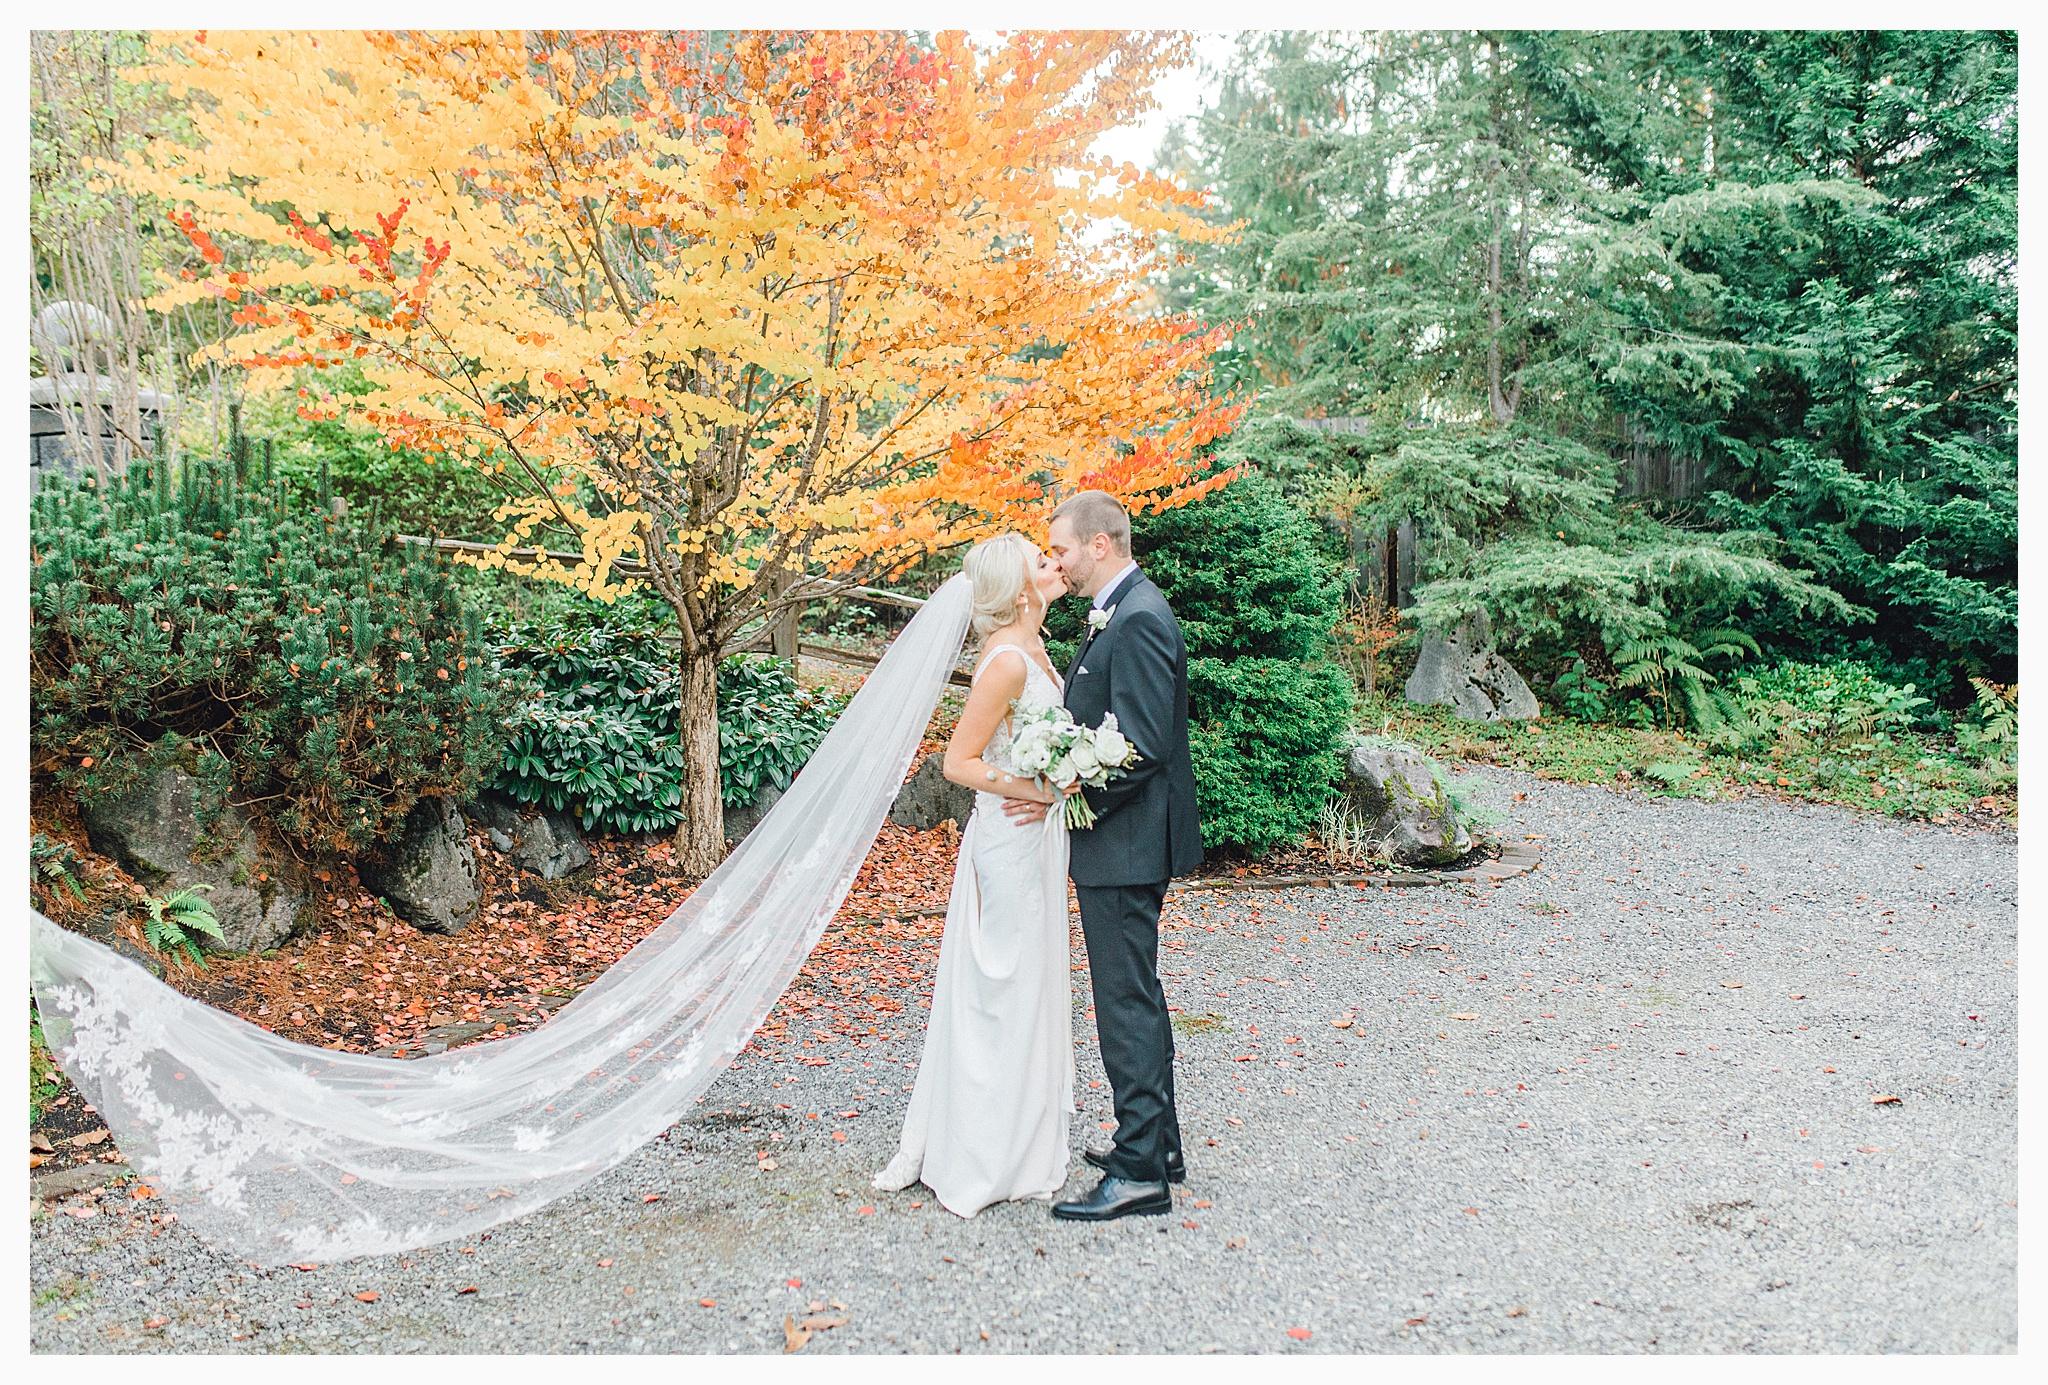 Emma Rose Company Light and Airy Wedding Photographer, Beautiful fall wedding at Rock Creek Gardens Venue in Puyallup, Washington._0084.jpg